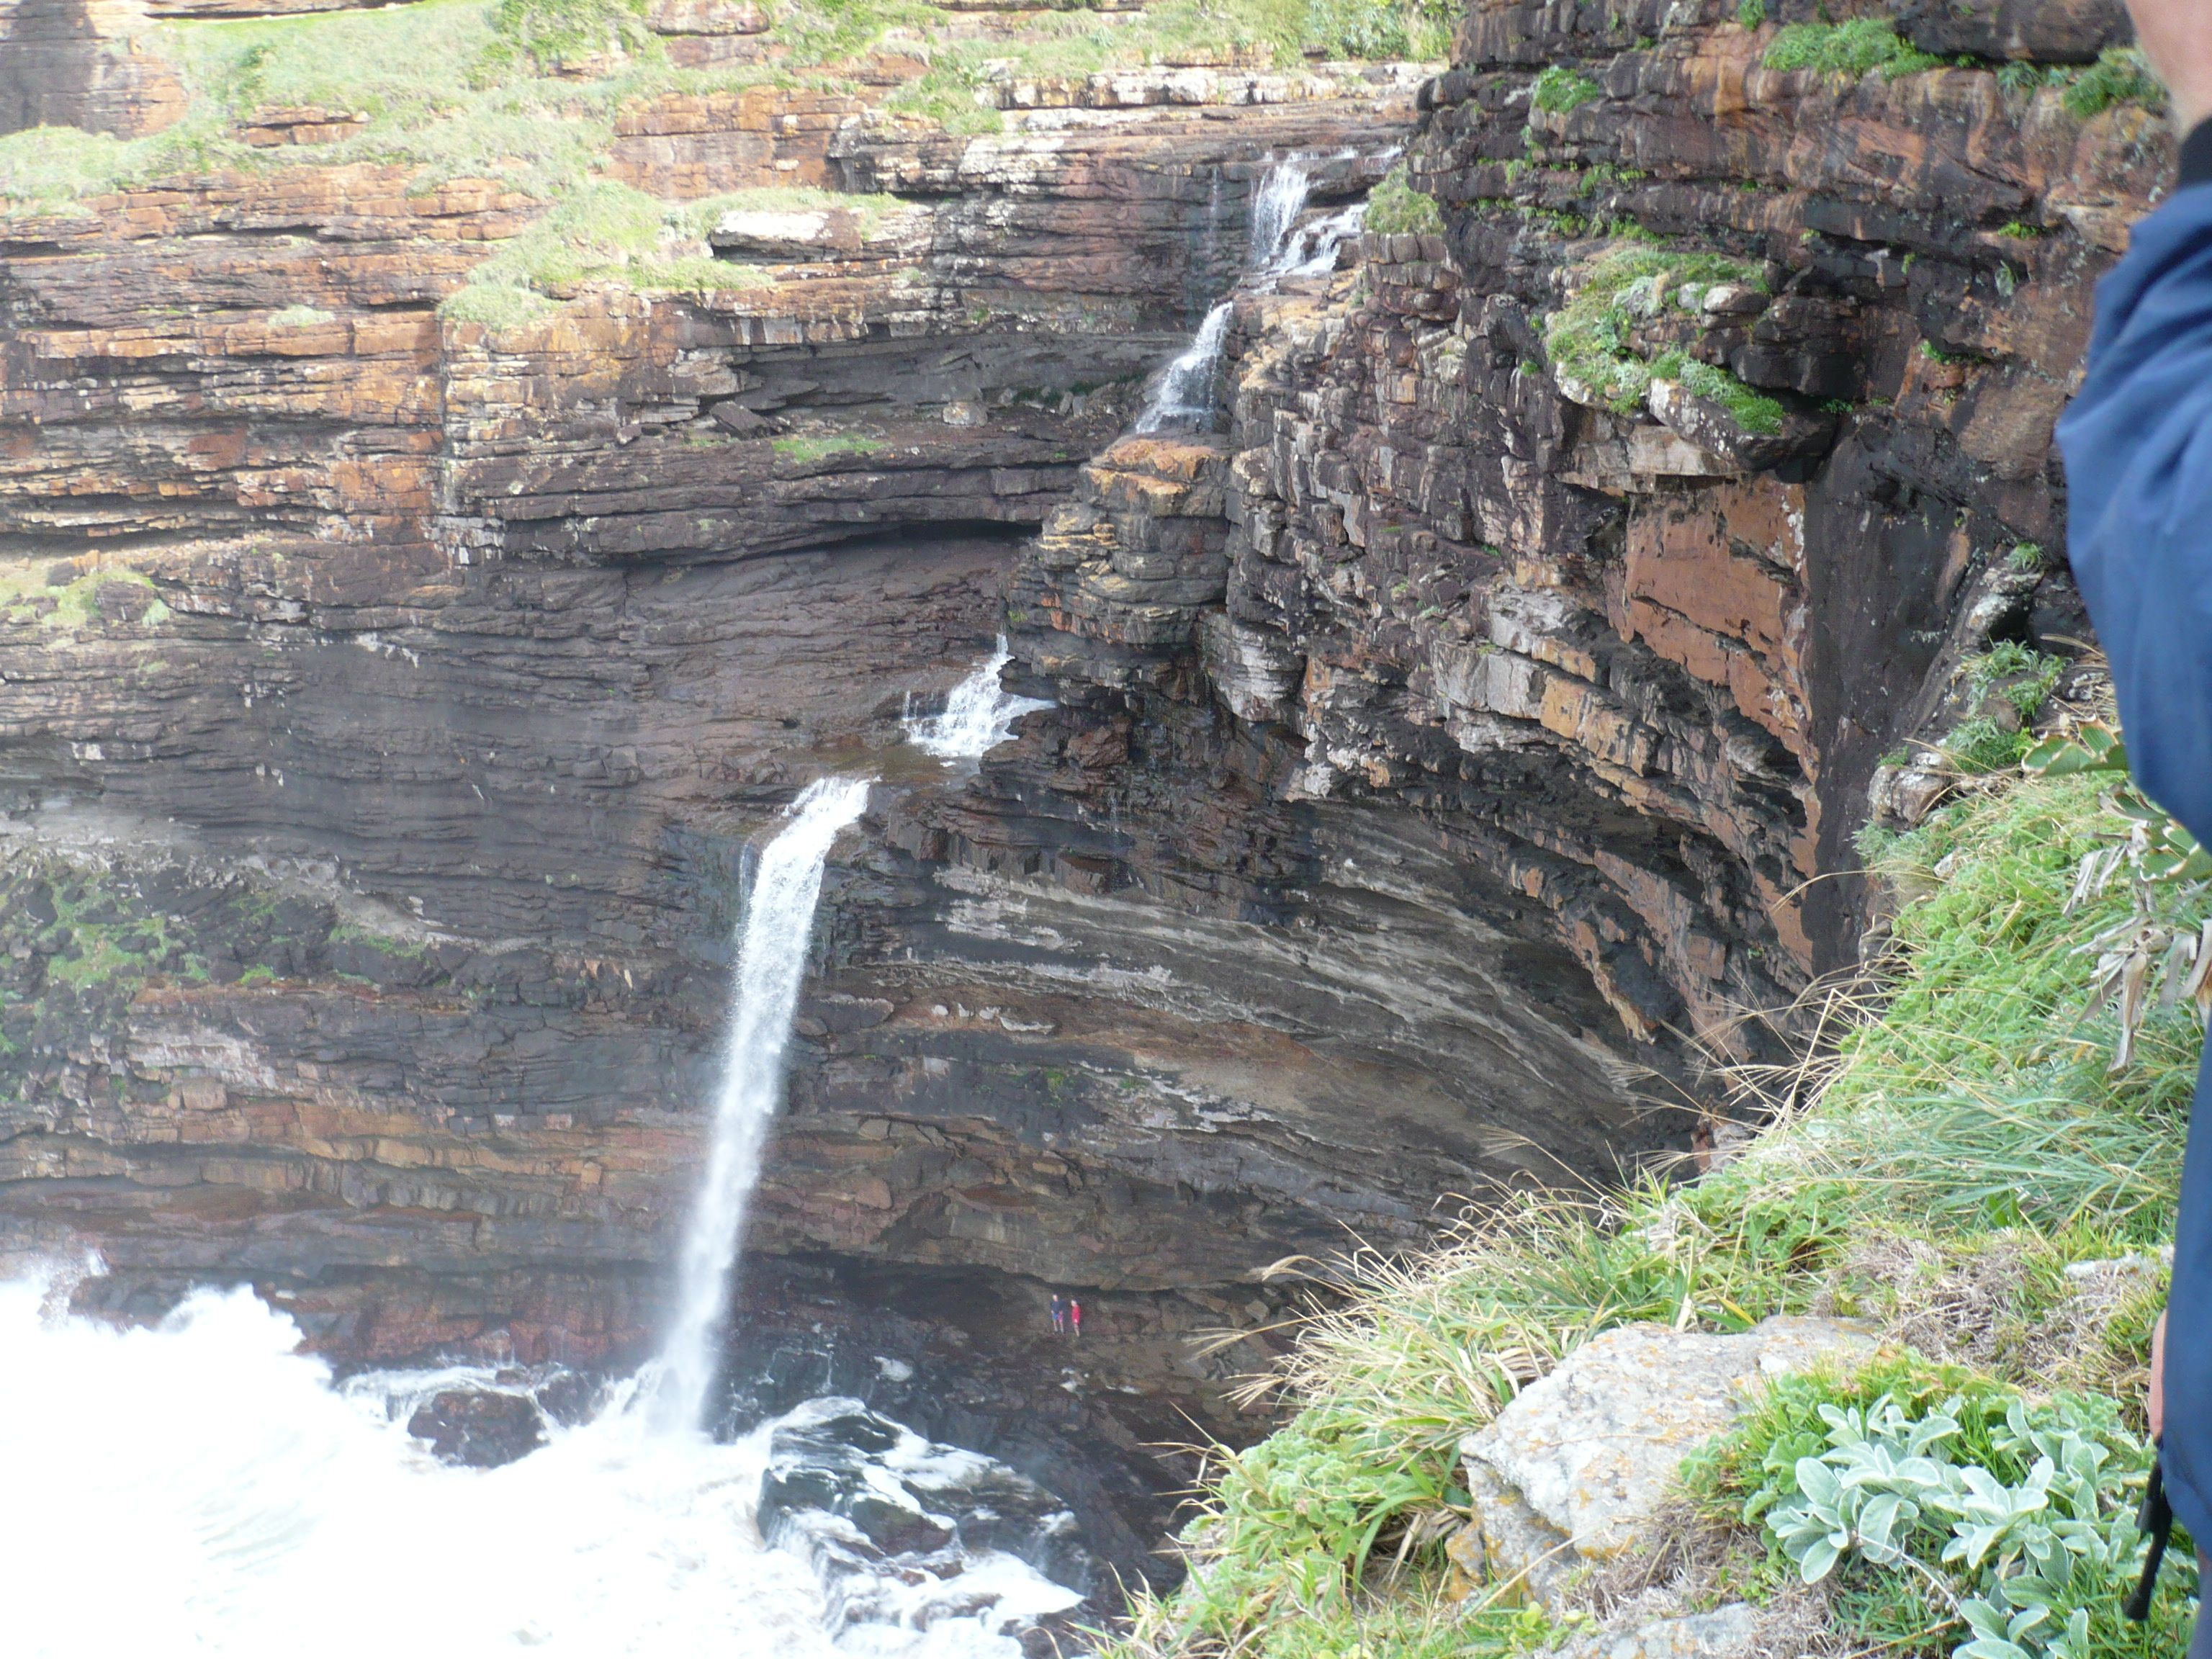 waterfall bluff transkei wild coast eastern cape south africa